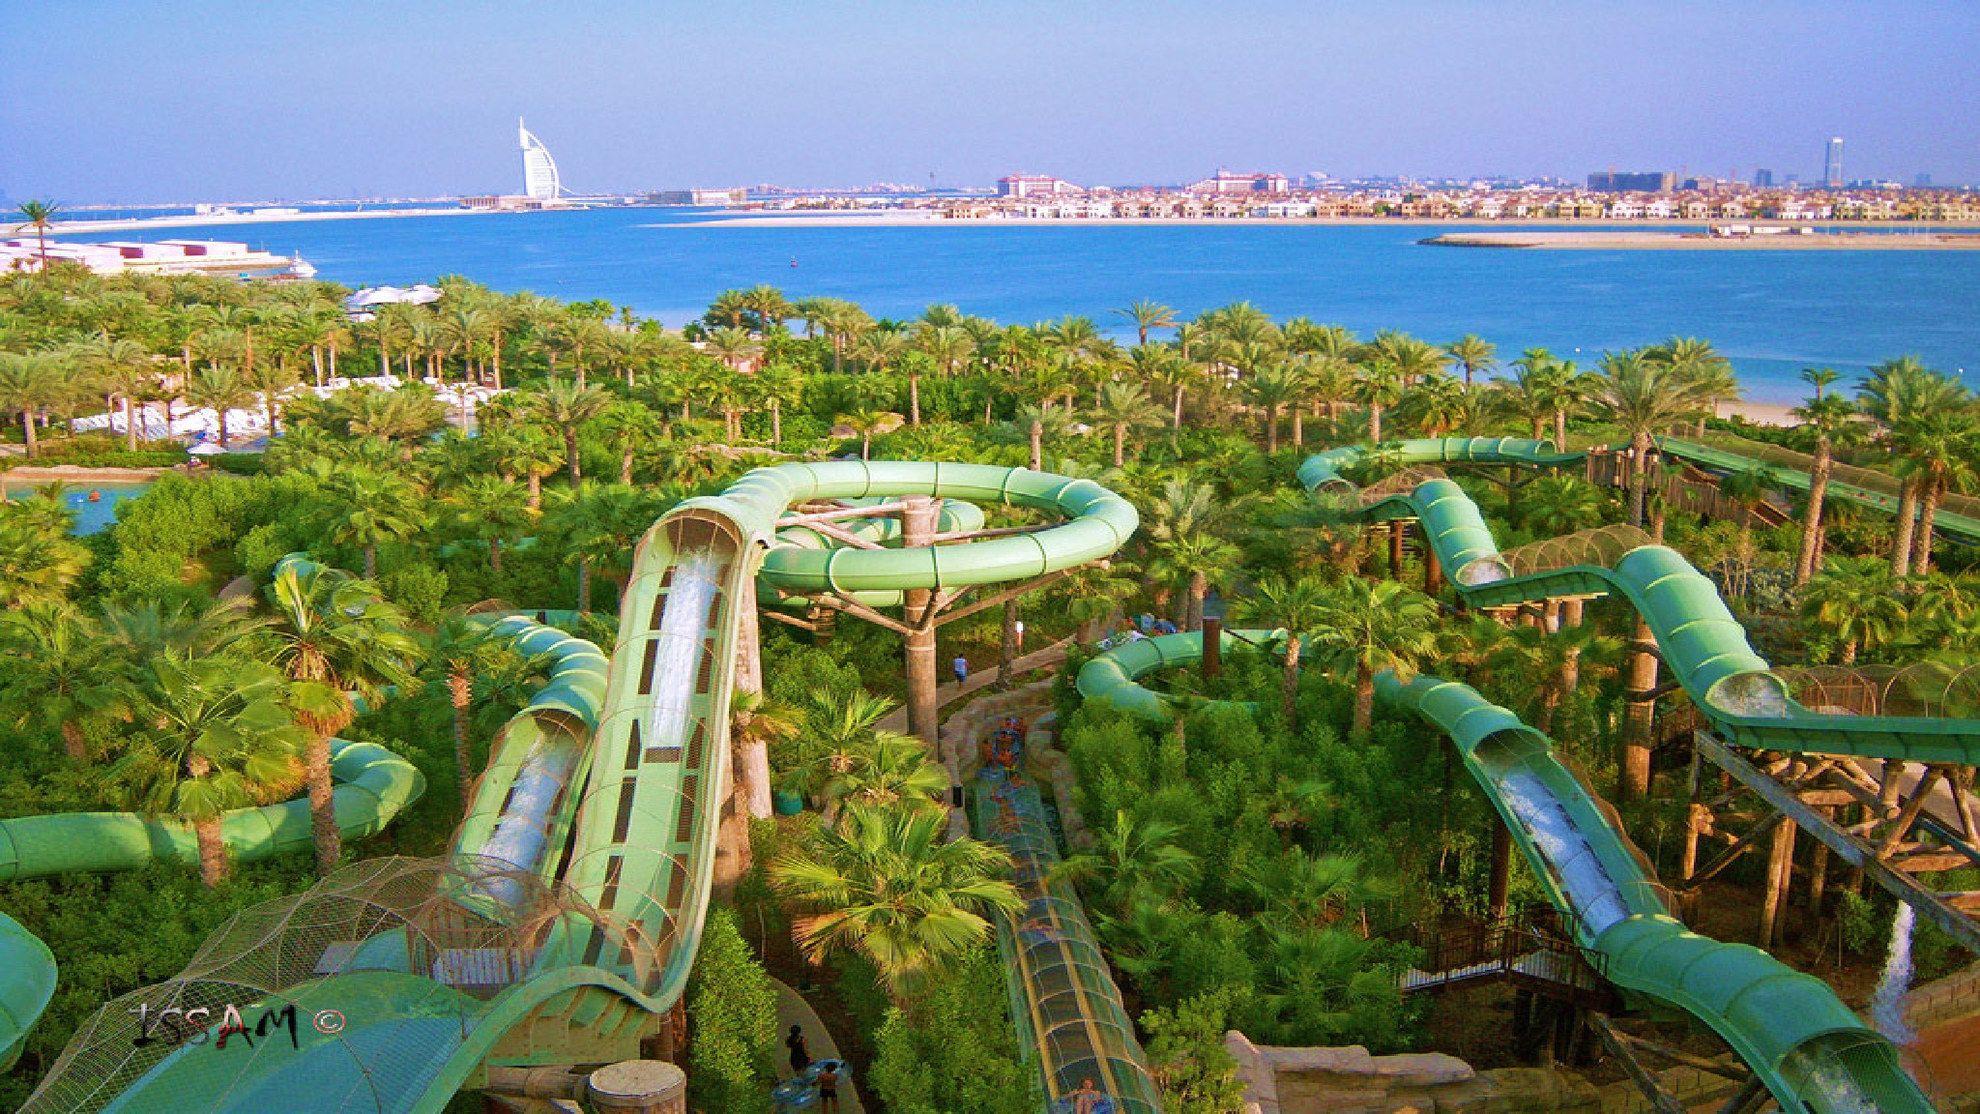 Trip report to Istanbul / Abu Dhabi / Dubai  |Palm Island Dubai From Burj Hotel